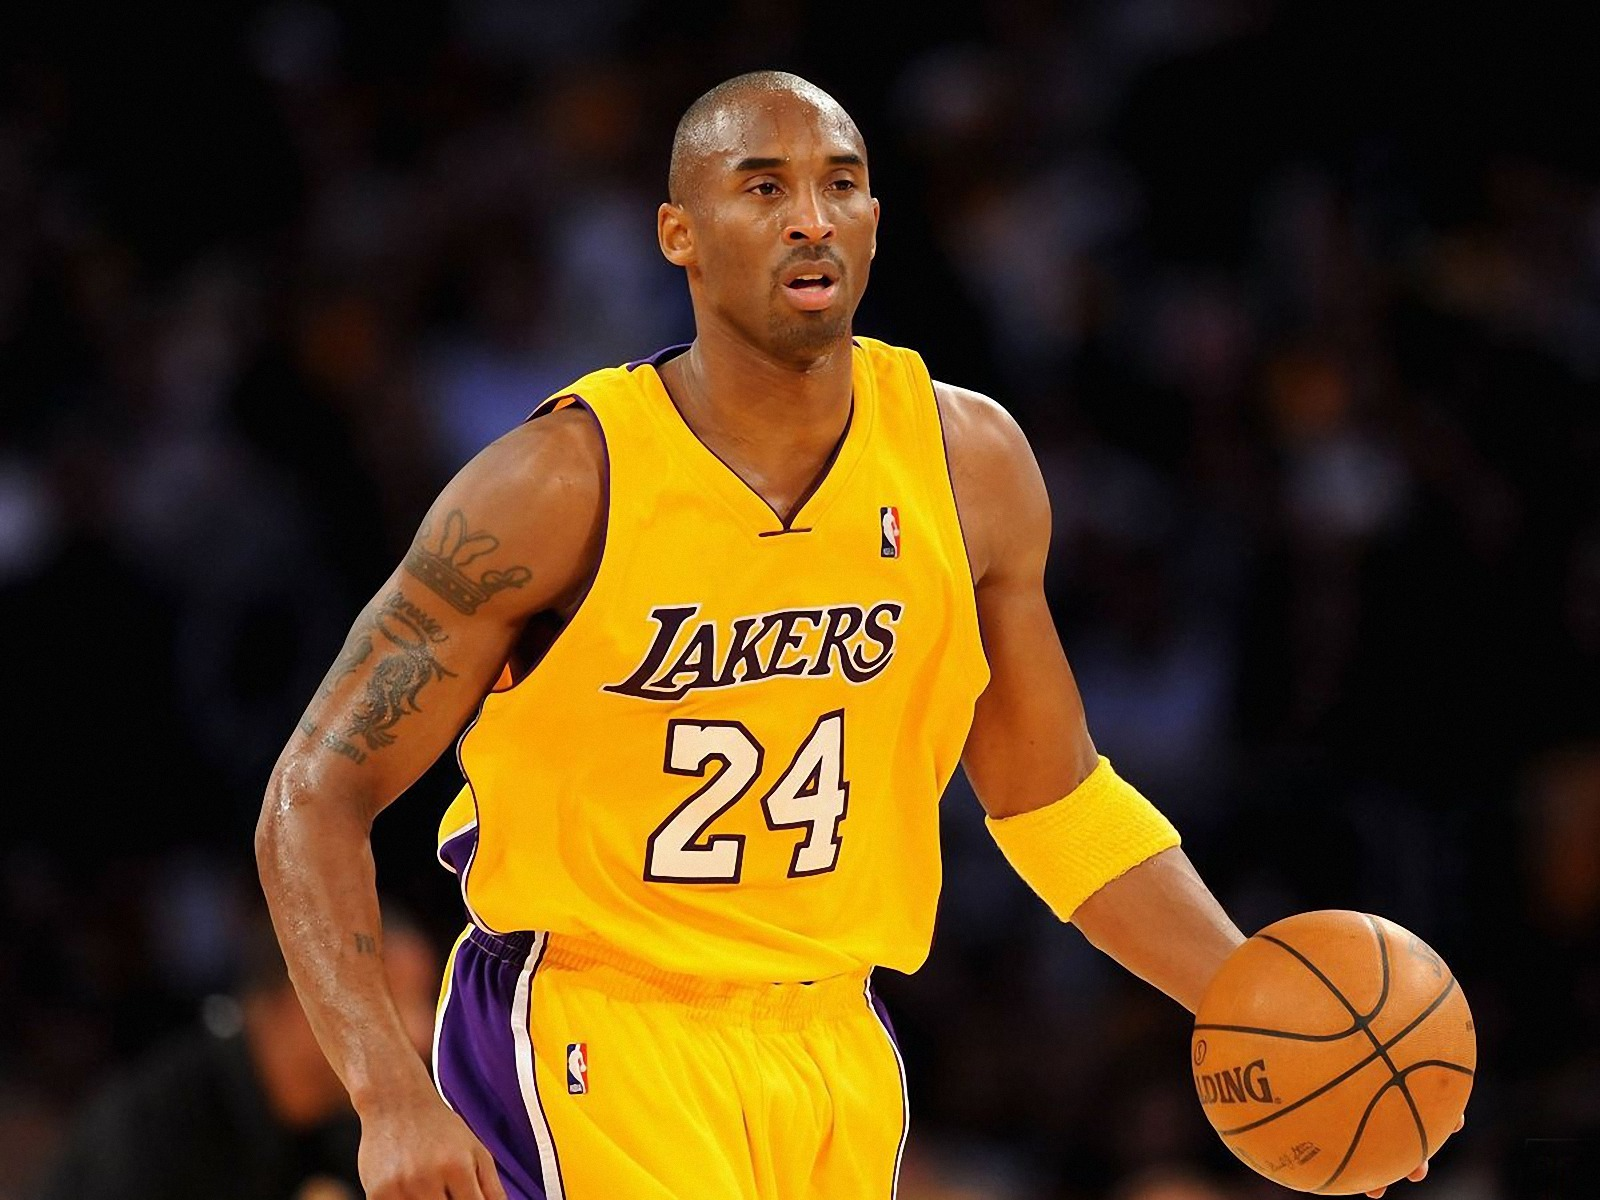 Pics Of Kobe Bryant